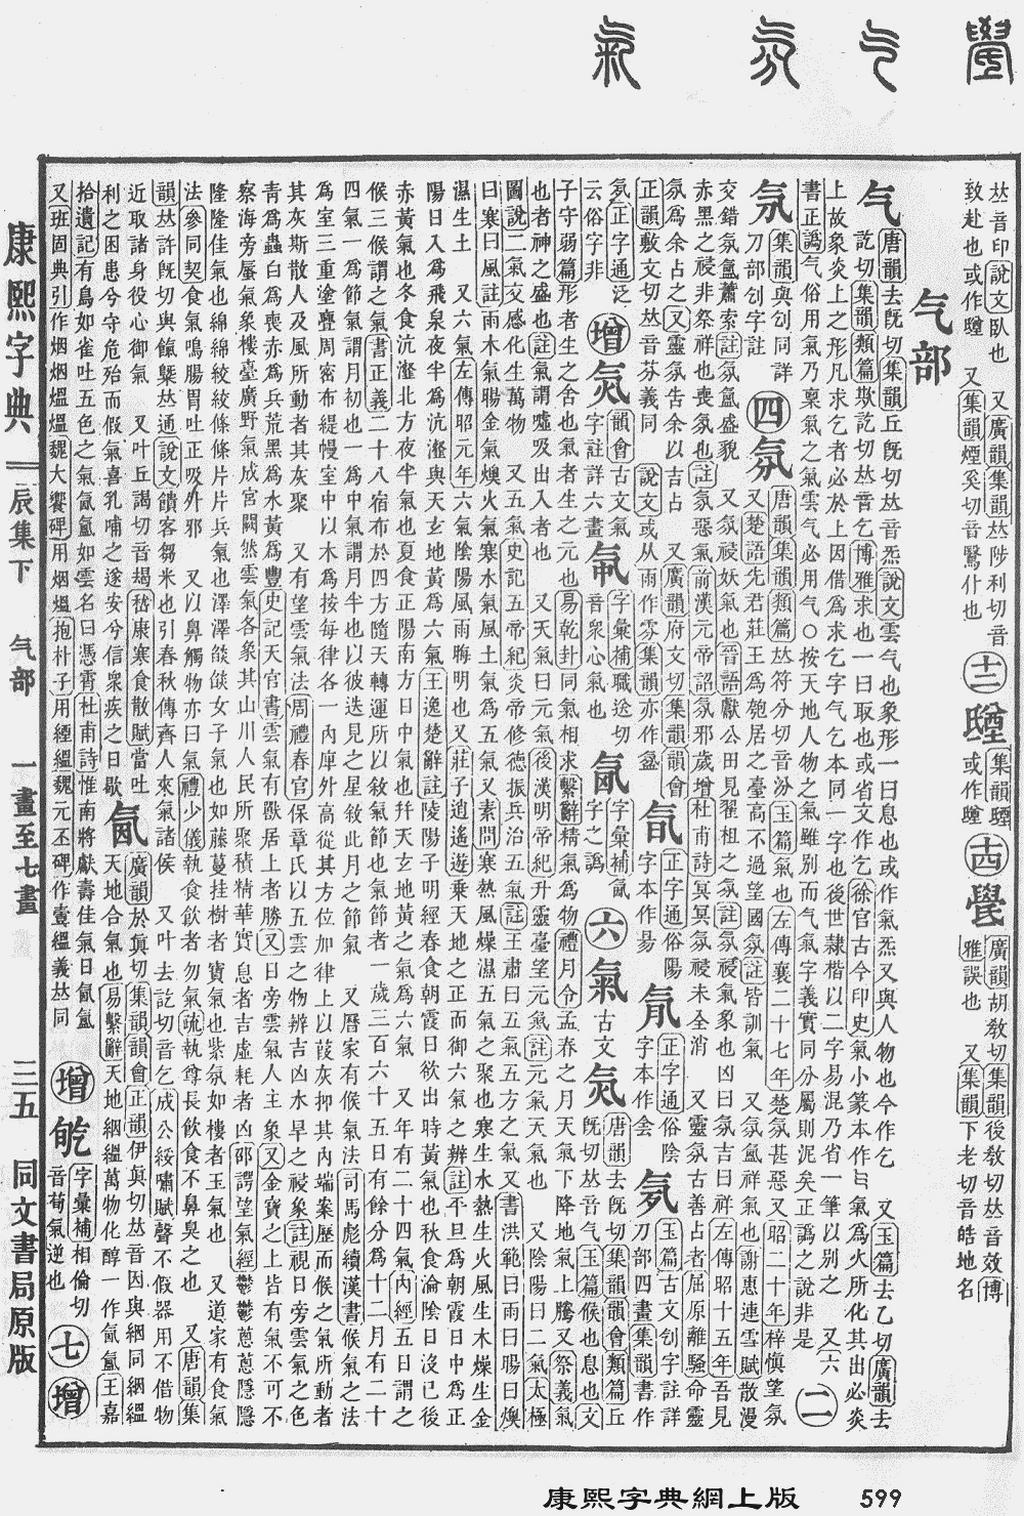 氣 qì dans le dictionnaire de l'empereur Kangxi